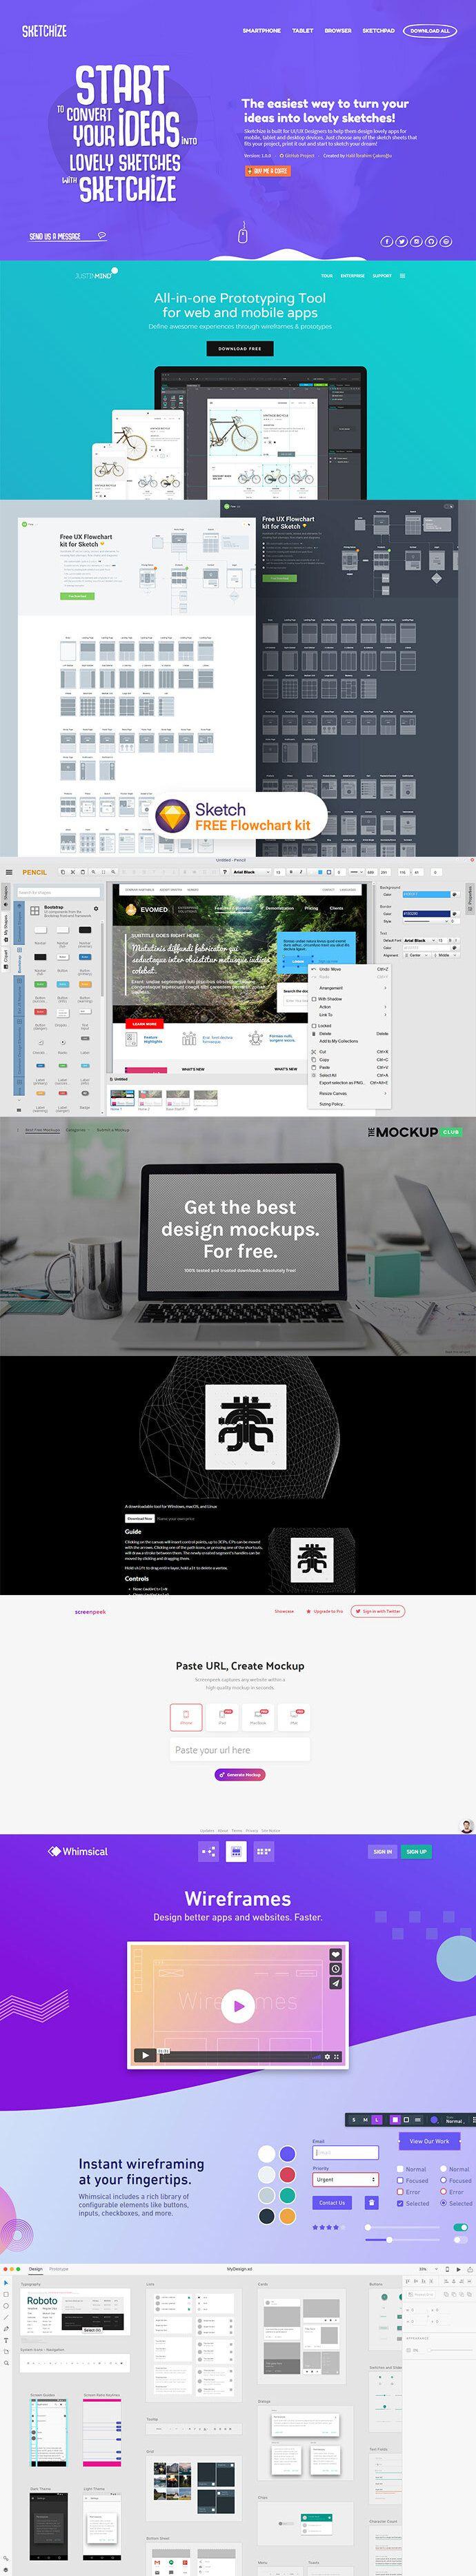 25 Best Free Design Tools For Wireframe Mockup Prototype Design Mockup Free Tool Design Interface Design